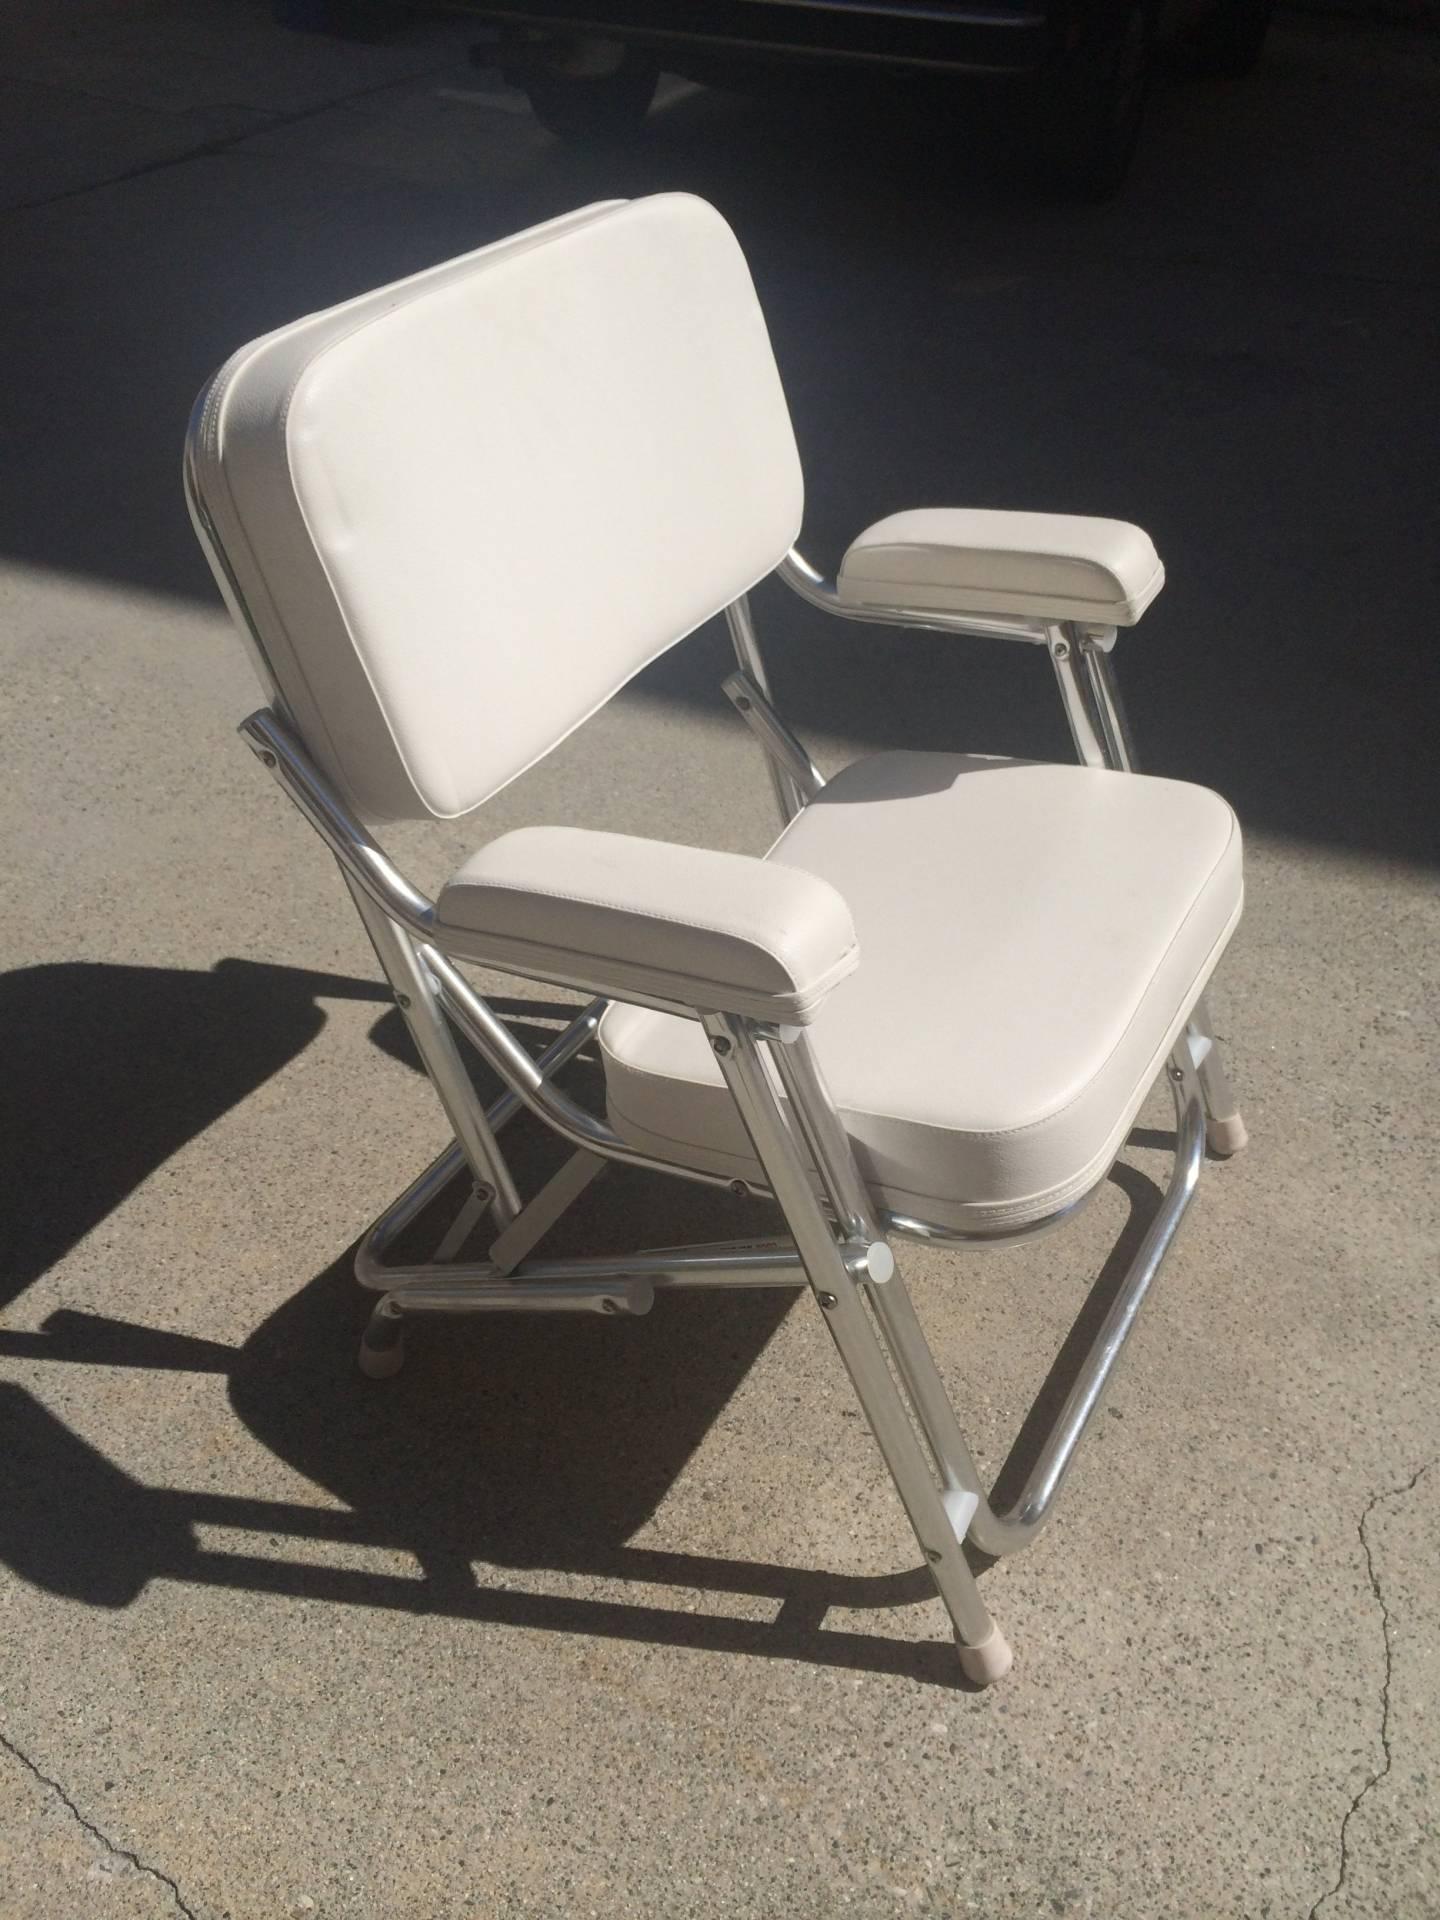 marine deck chairs chair covers for a wedding reception two west aluminum cushion bloodydecks kjg jpg